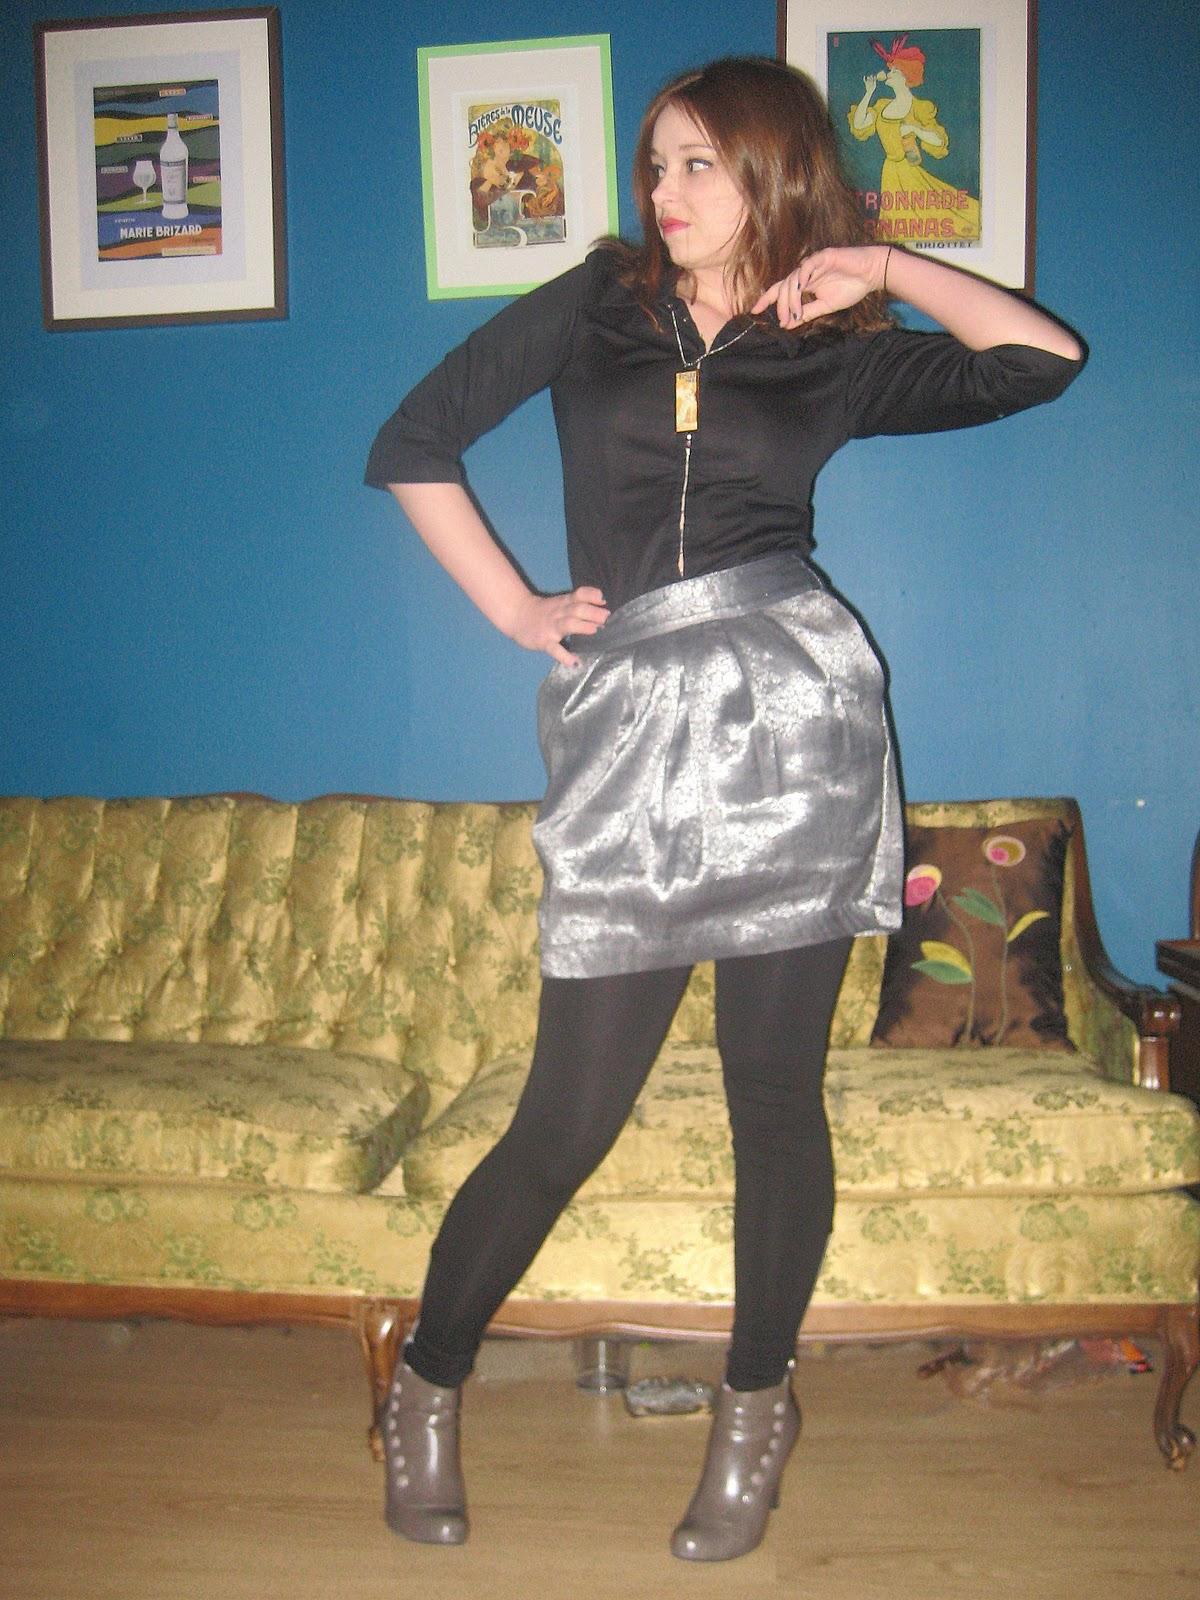 http://1.bp.blogspot.com/_lDrdMSZbdx0/S8r_LLw-K0I/AAAAAAAABJ0/wqjaZ5jGliI/s1600/girlyrocker4.jpg